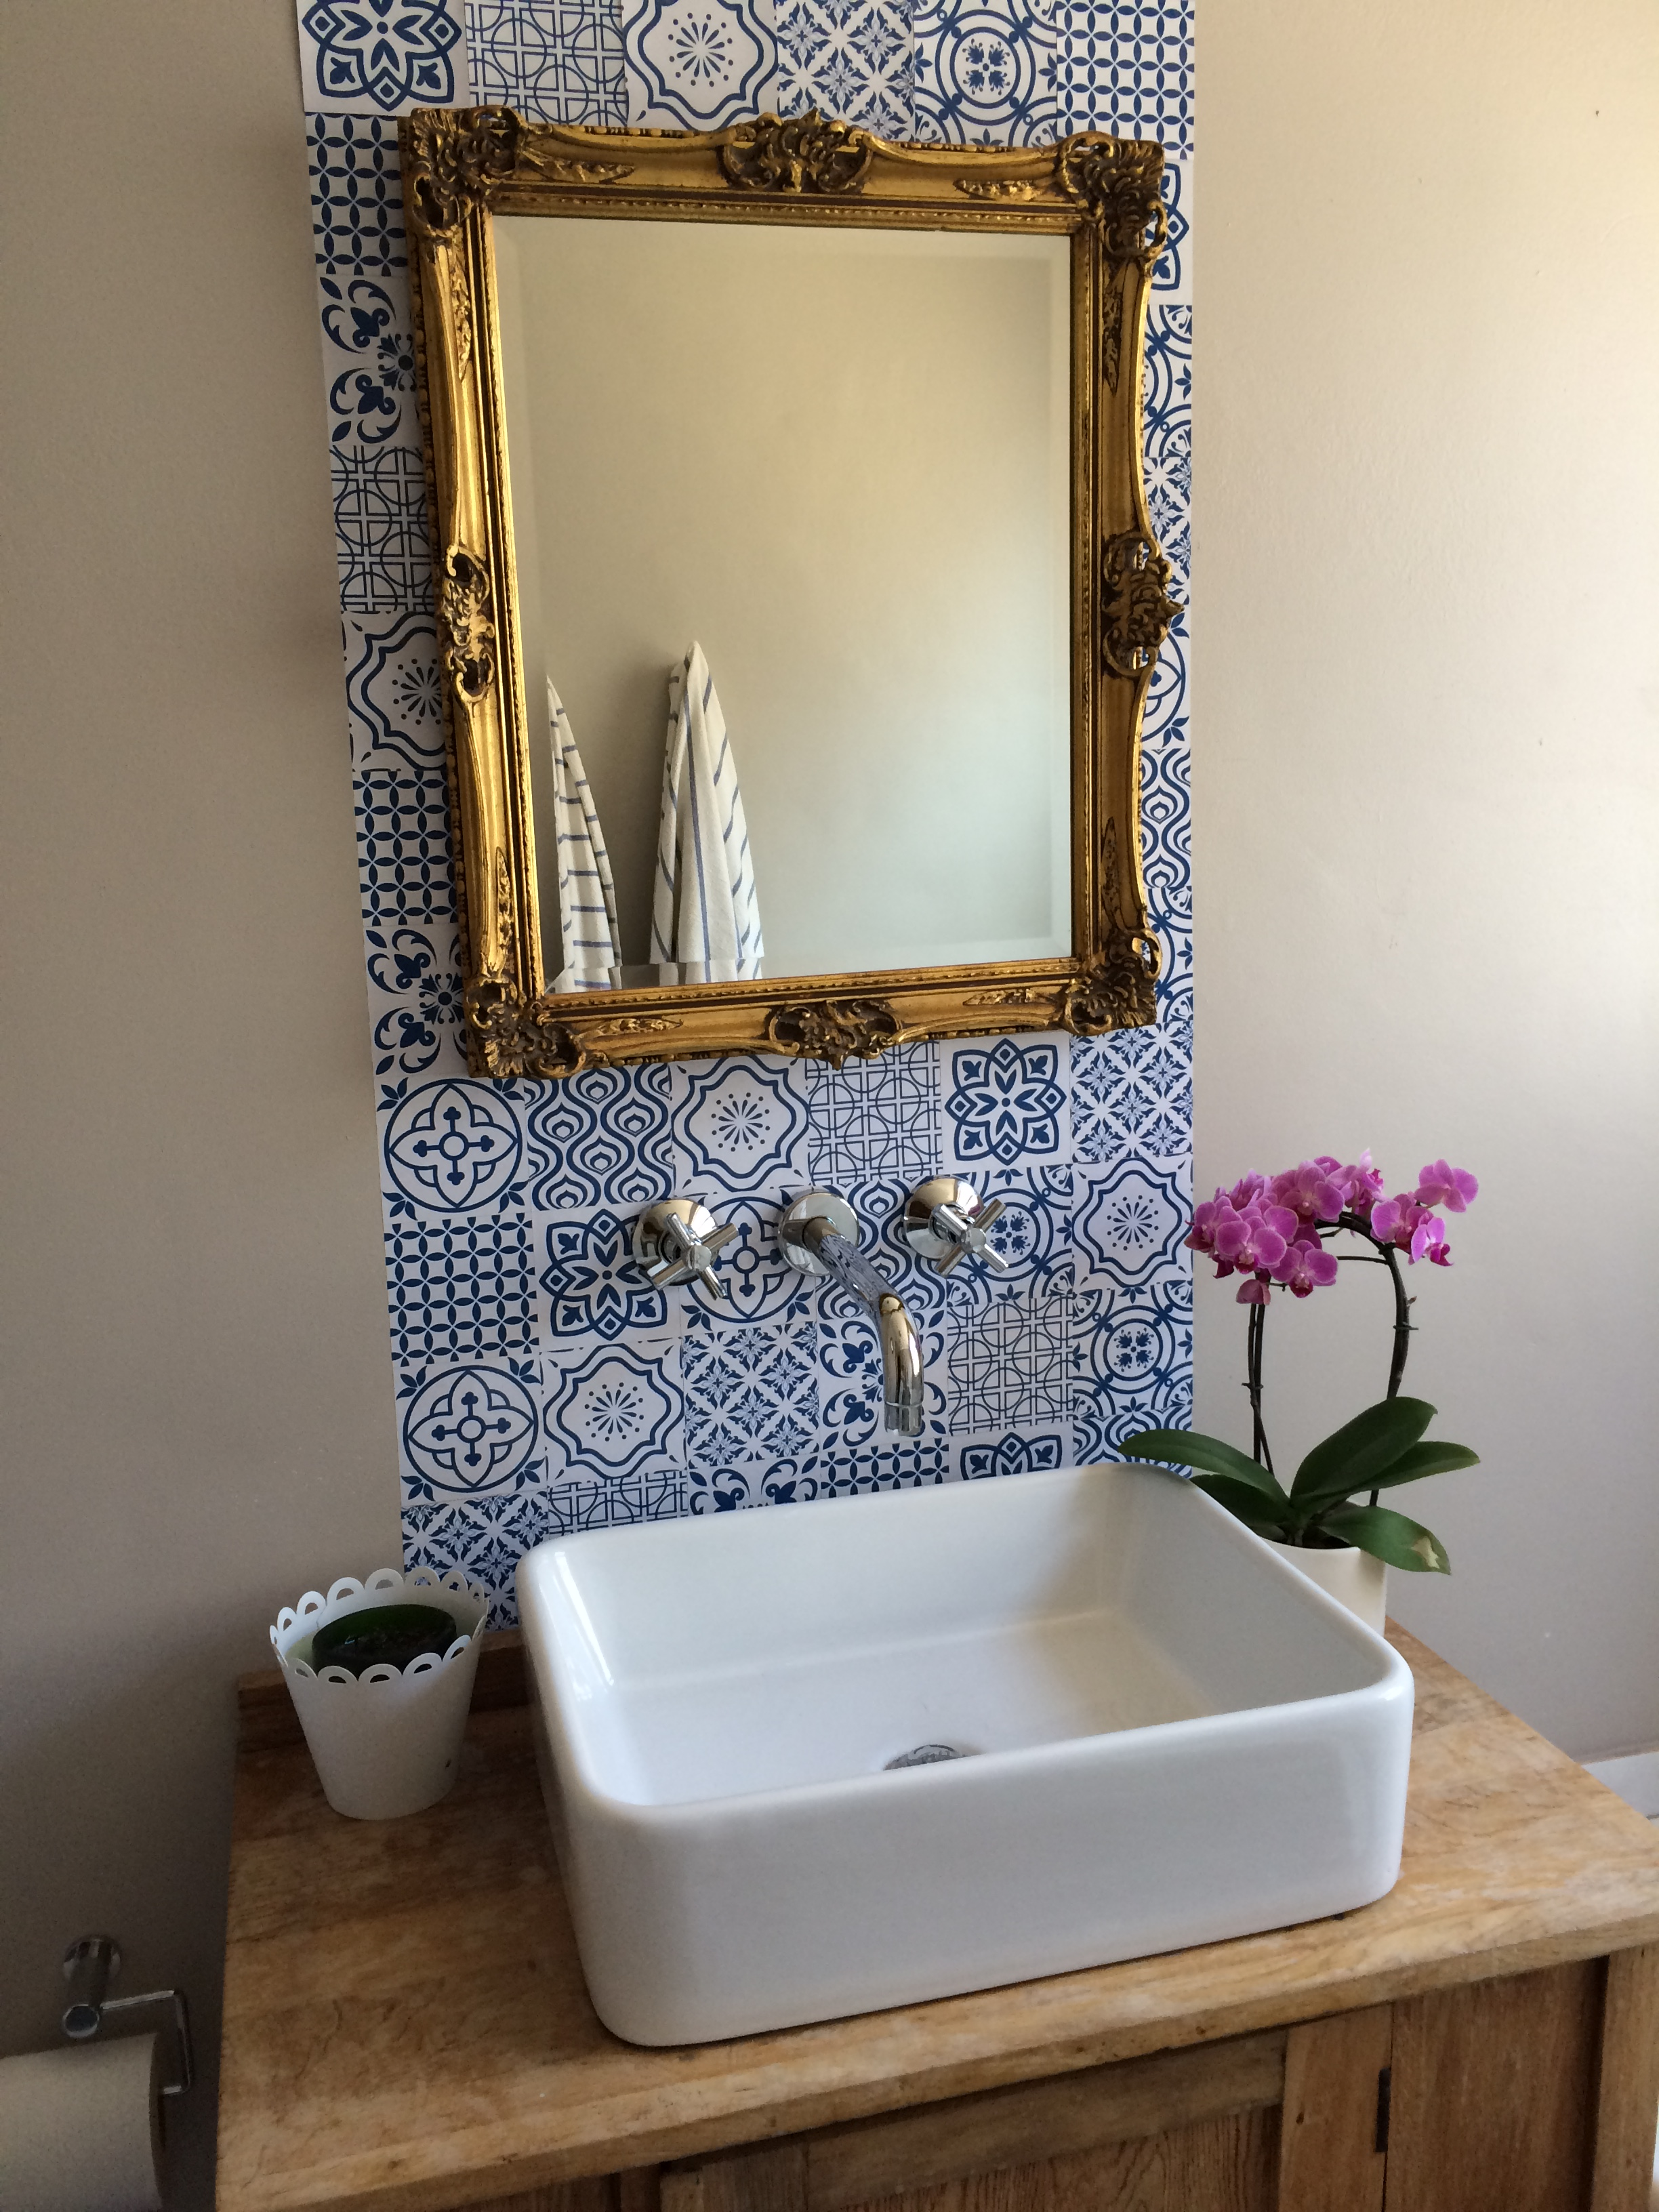 a tiled backsplash in a bathroom